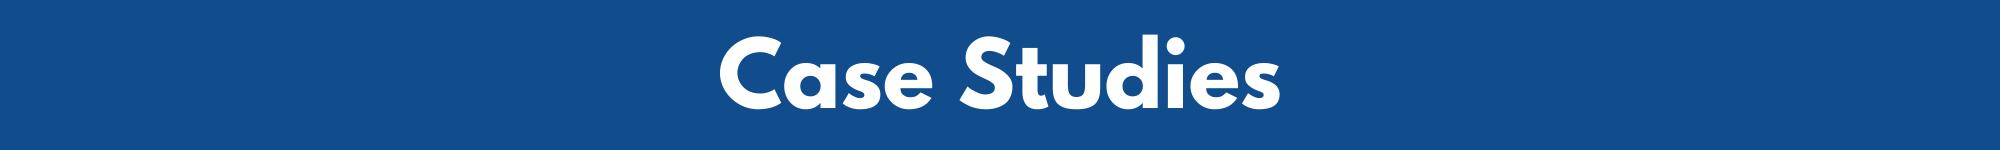 Case-Studies_image